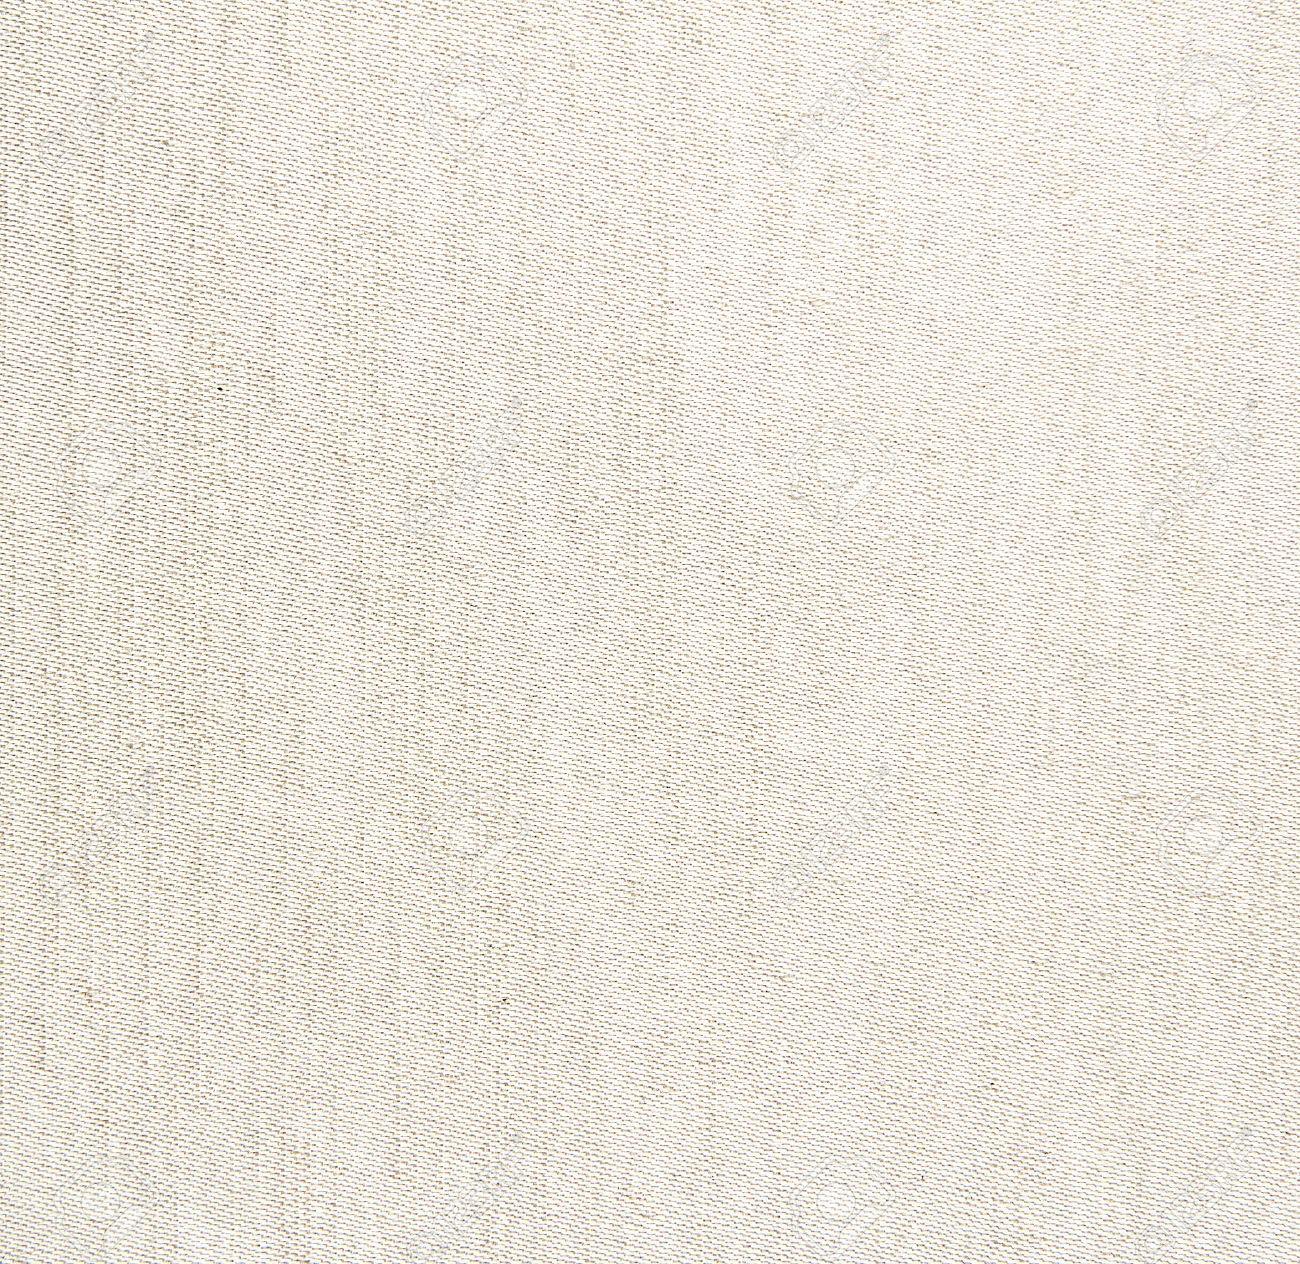 High resolution seamless linen canvas background - 13158560